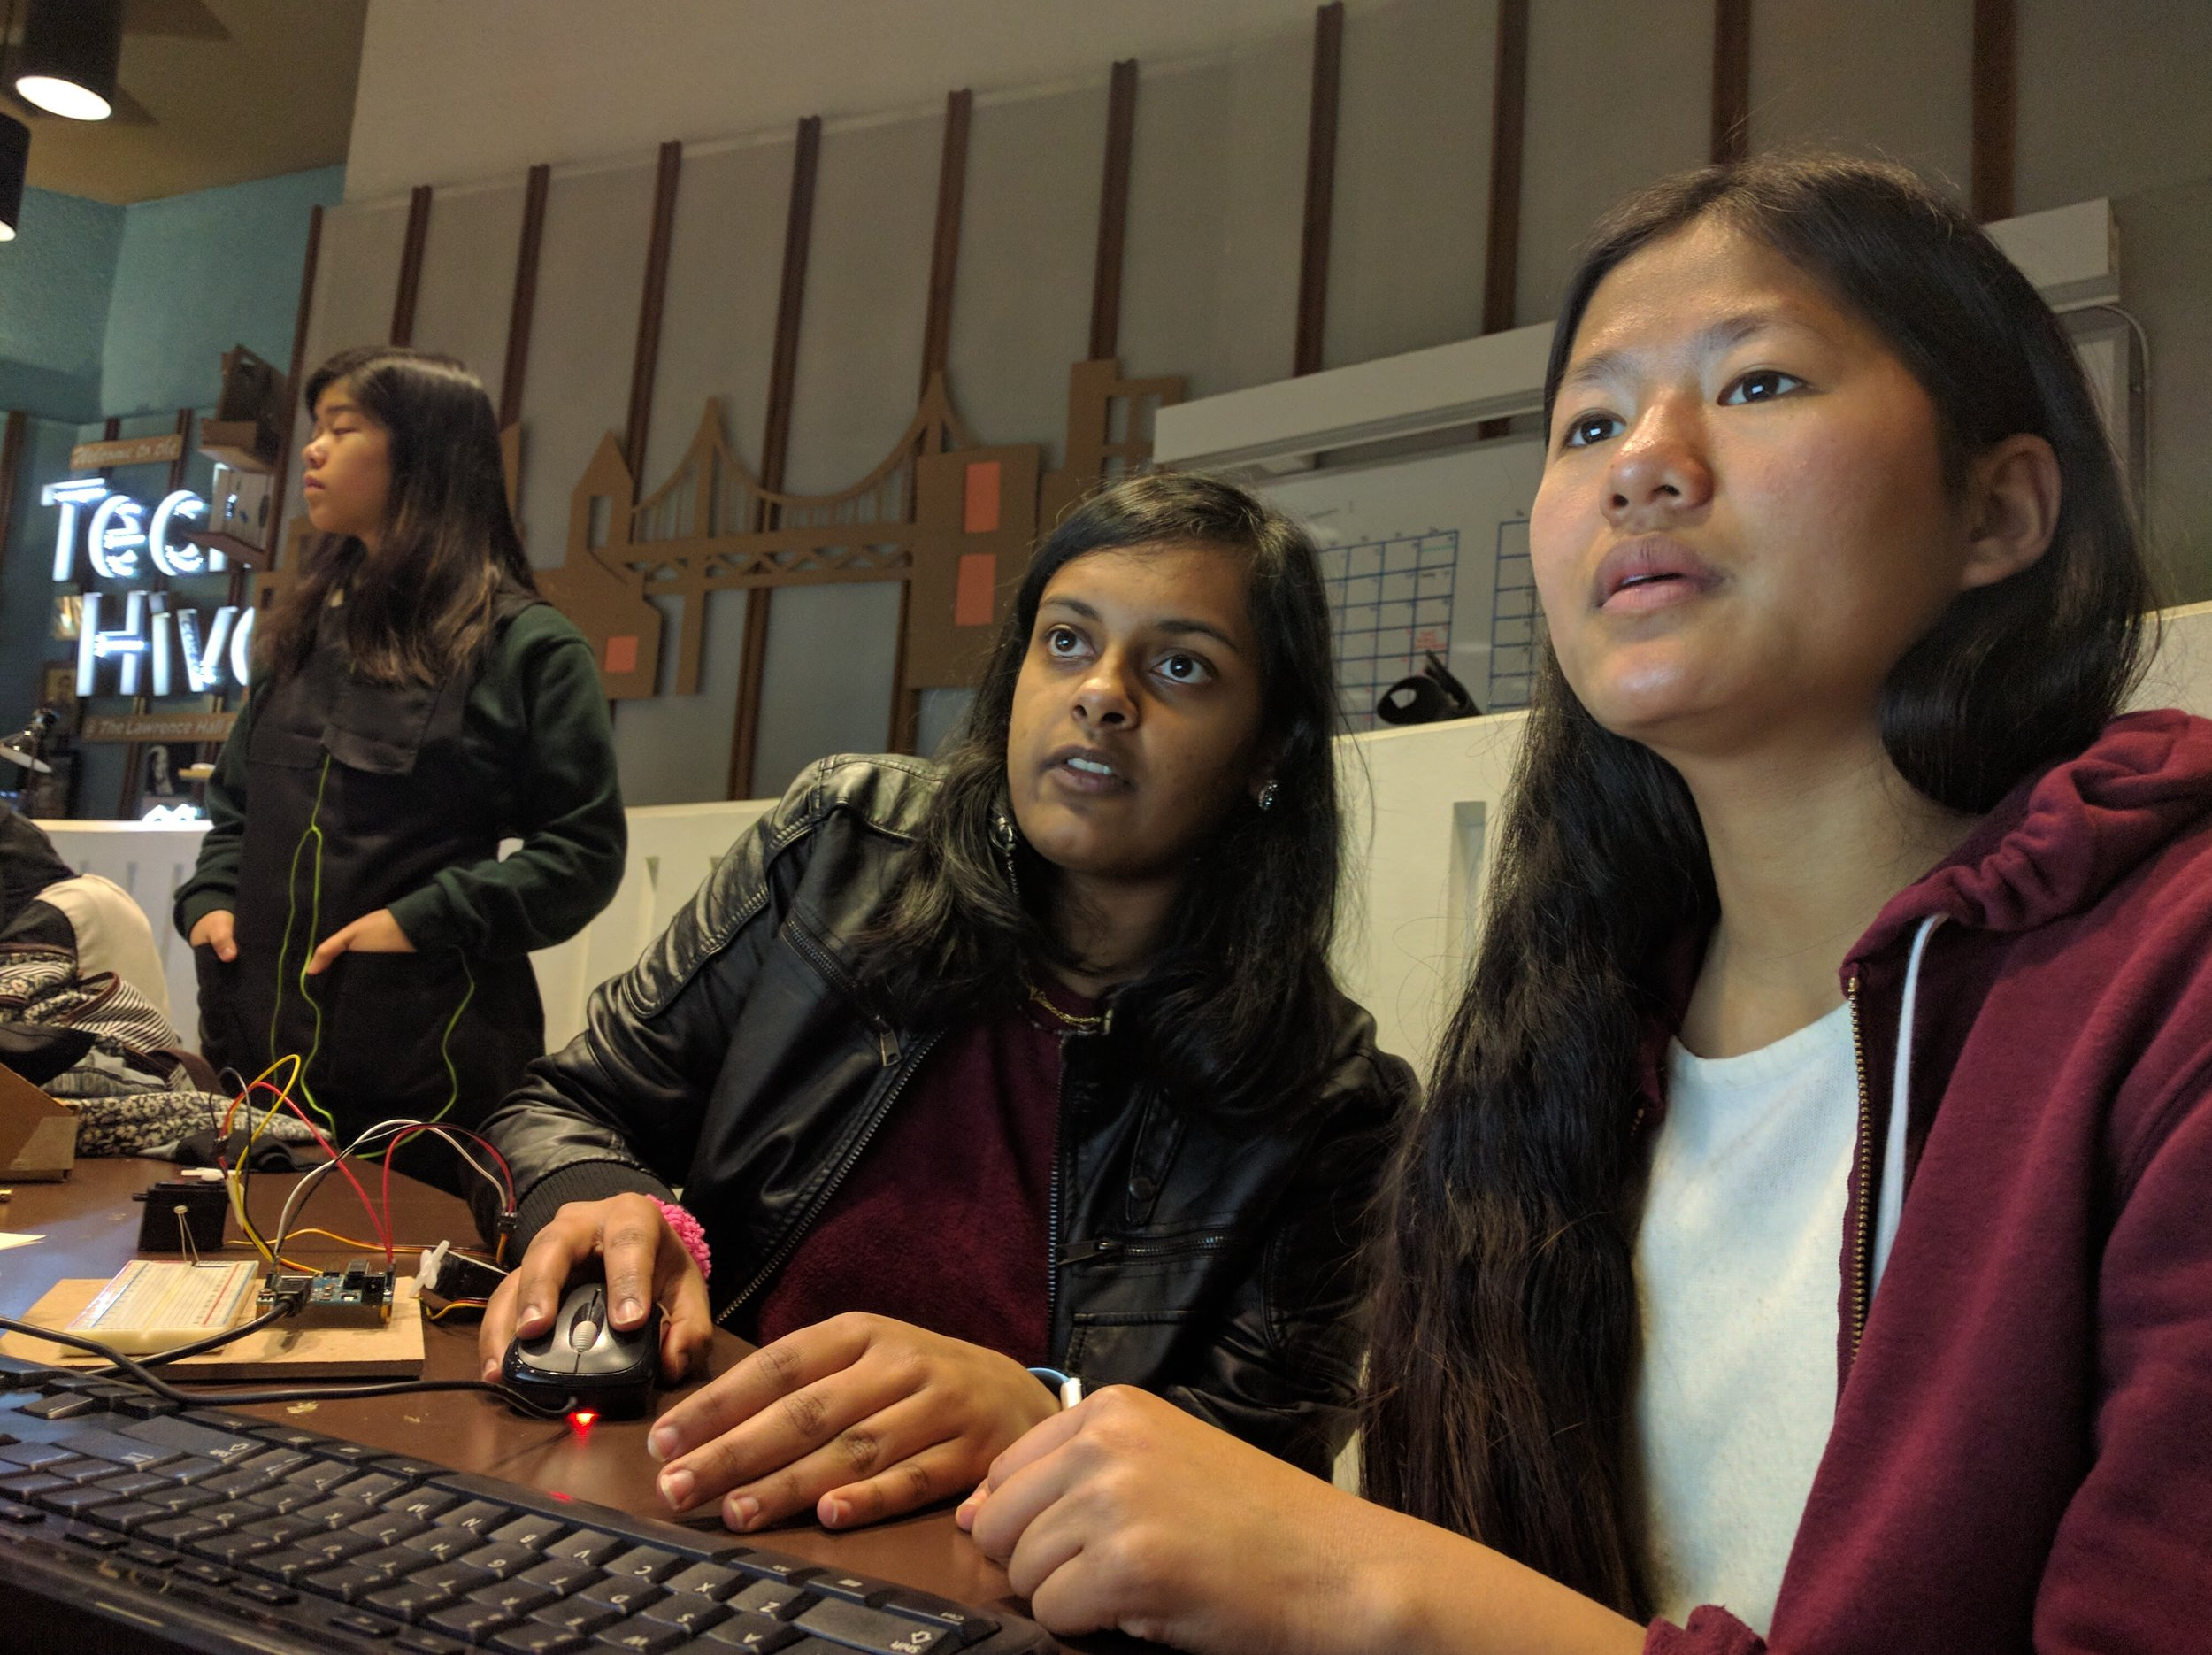 Neesha and Radhika coding away!